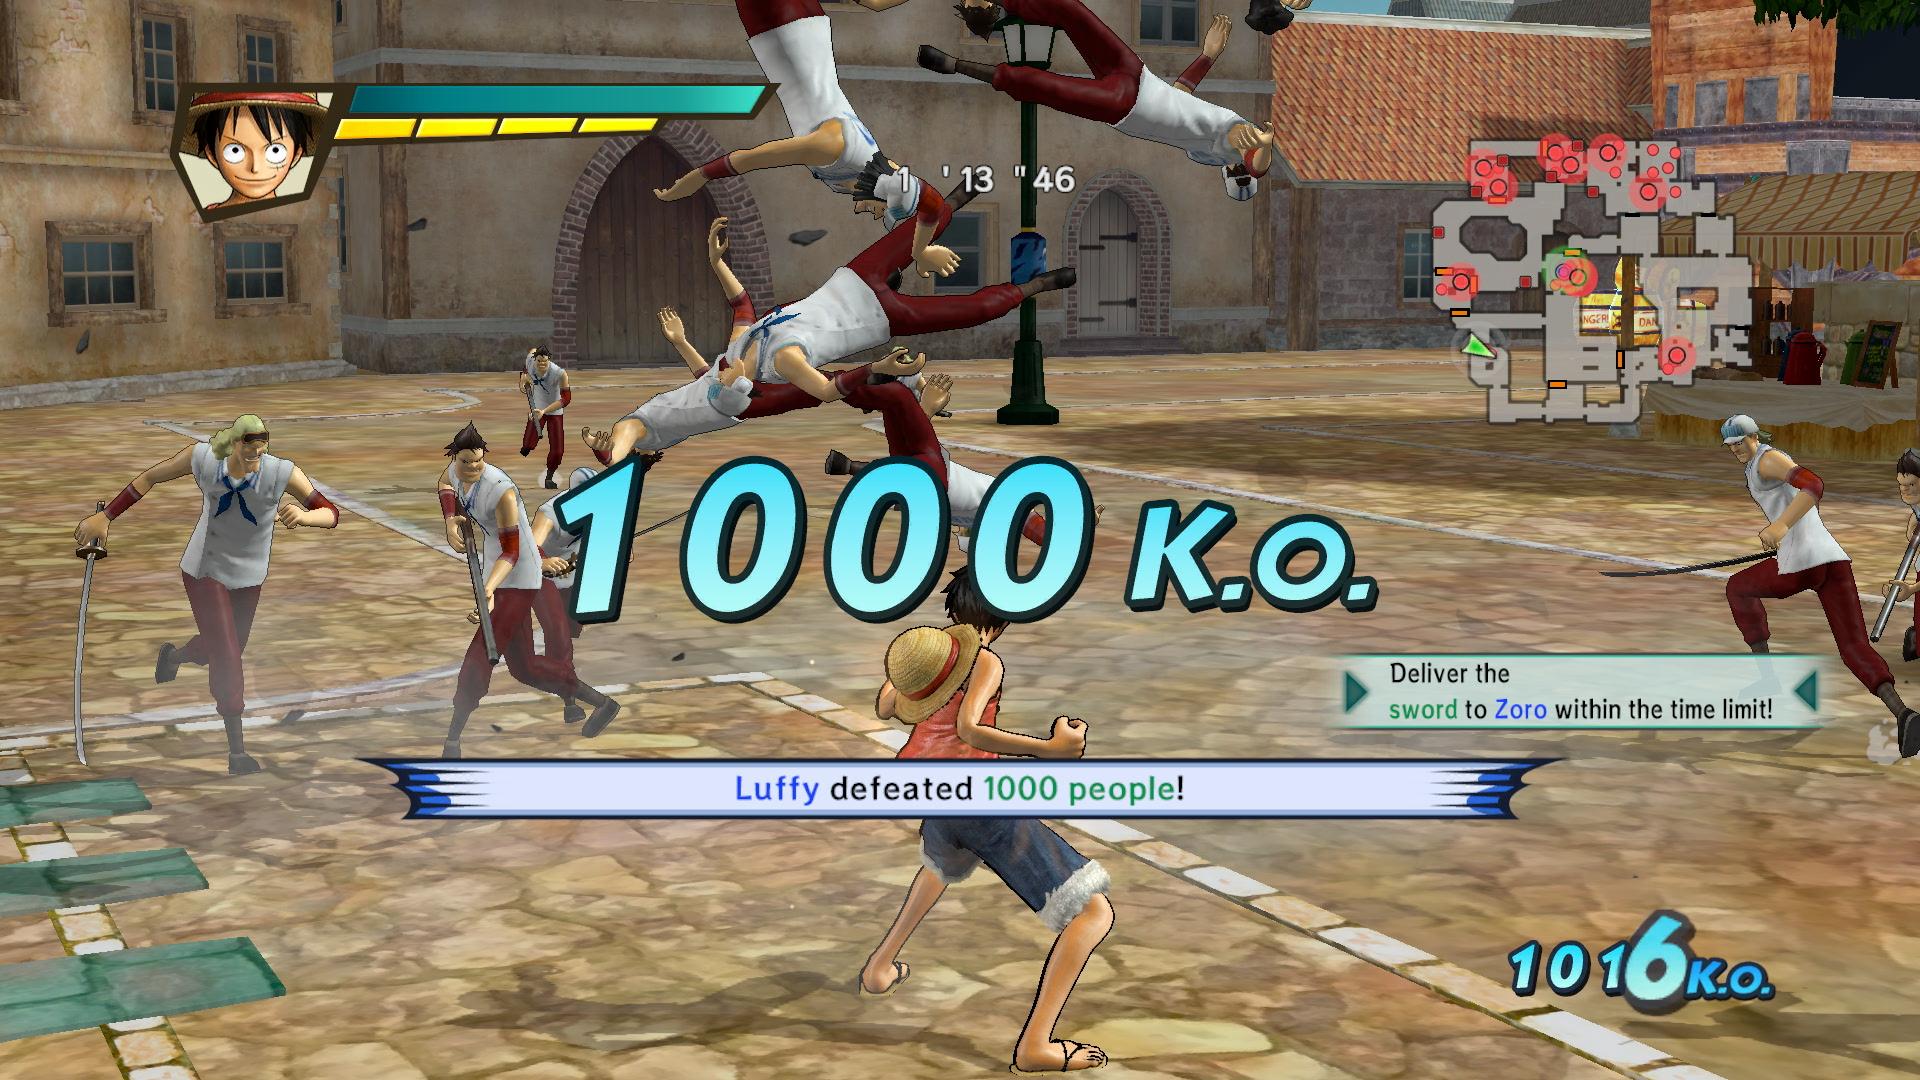 One Piece Pirate Warriors 3 - 1000 KOs